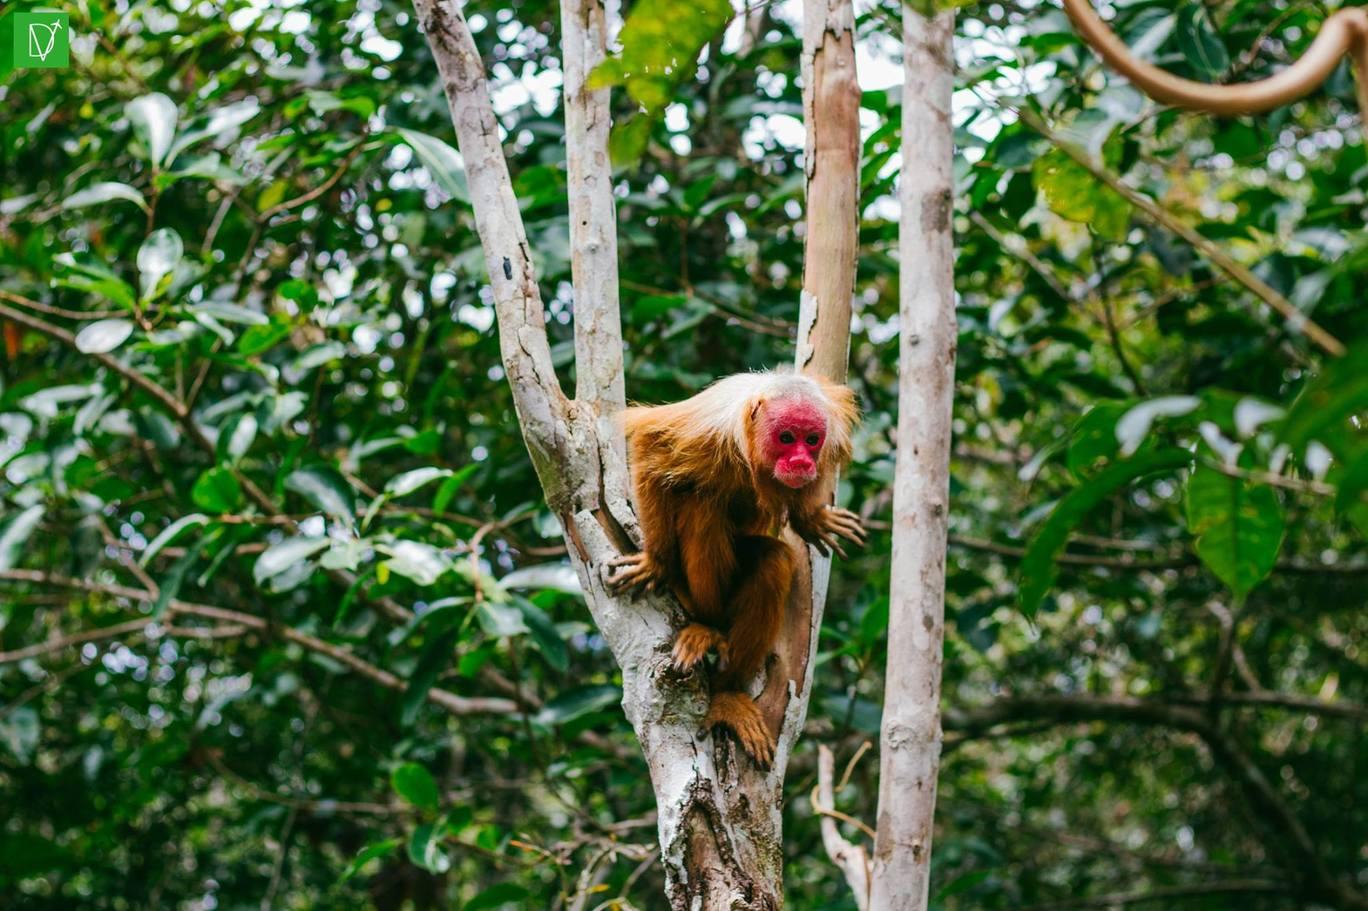 Photo of Amazonas Brazil 2018 - Nature of life By Matan Cohen Donttellma